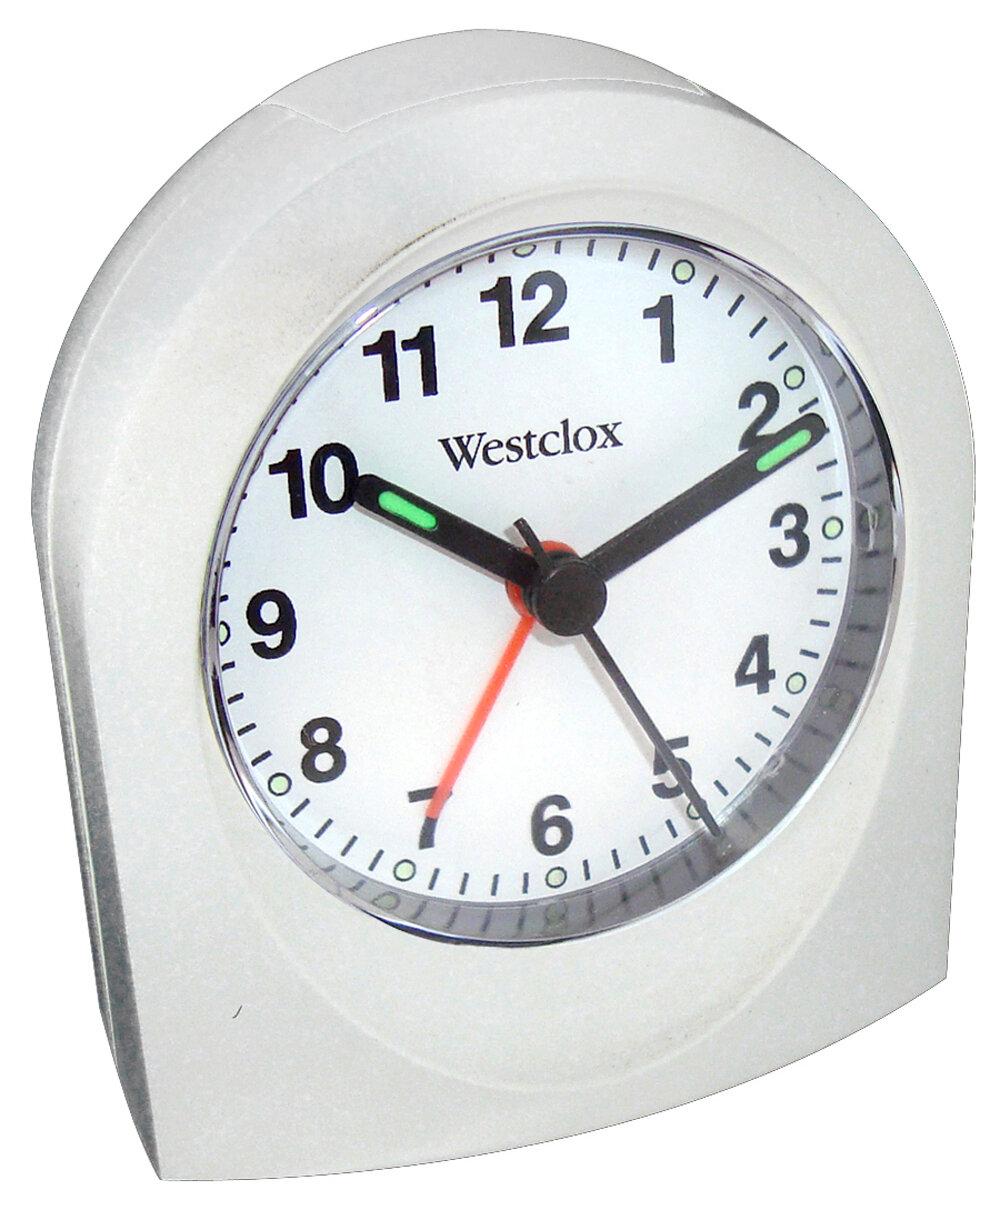 Westclox Clocks Bedside Analog Alarm Clock